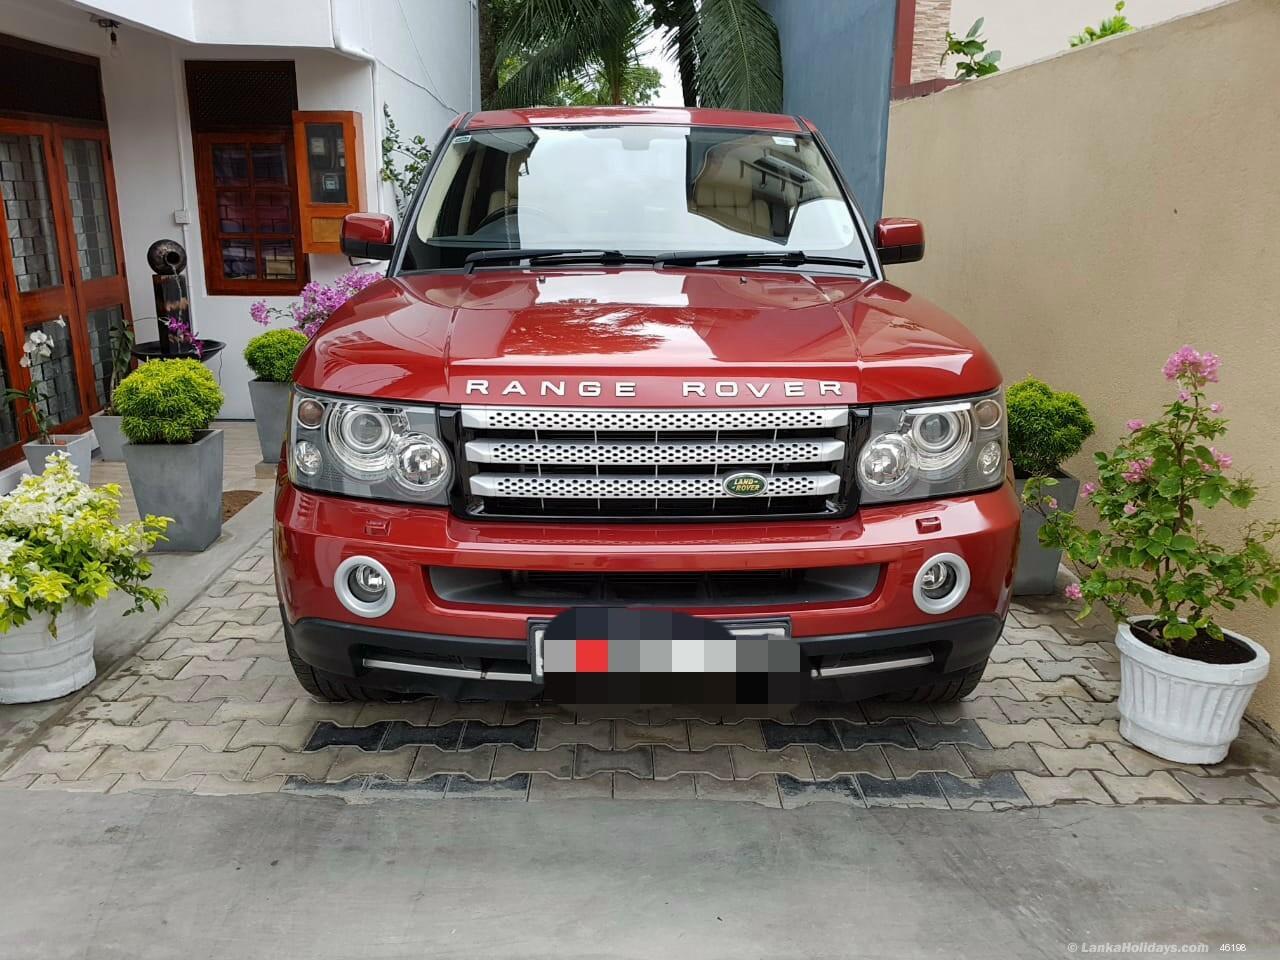 Sri Lanka Jeep Rentals/Hire - Range Rover Sport for Rent